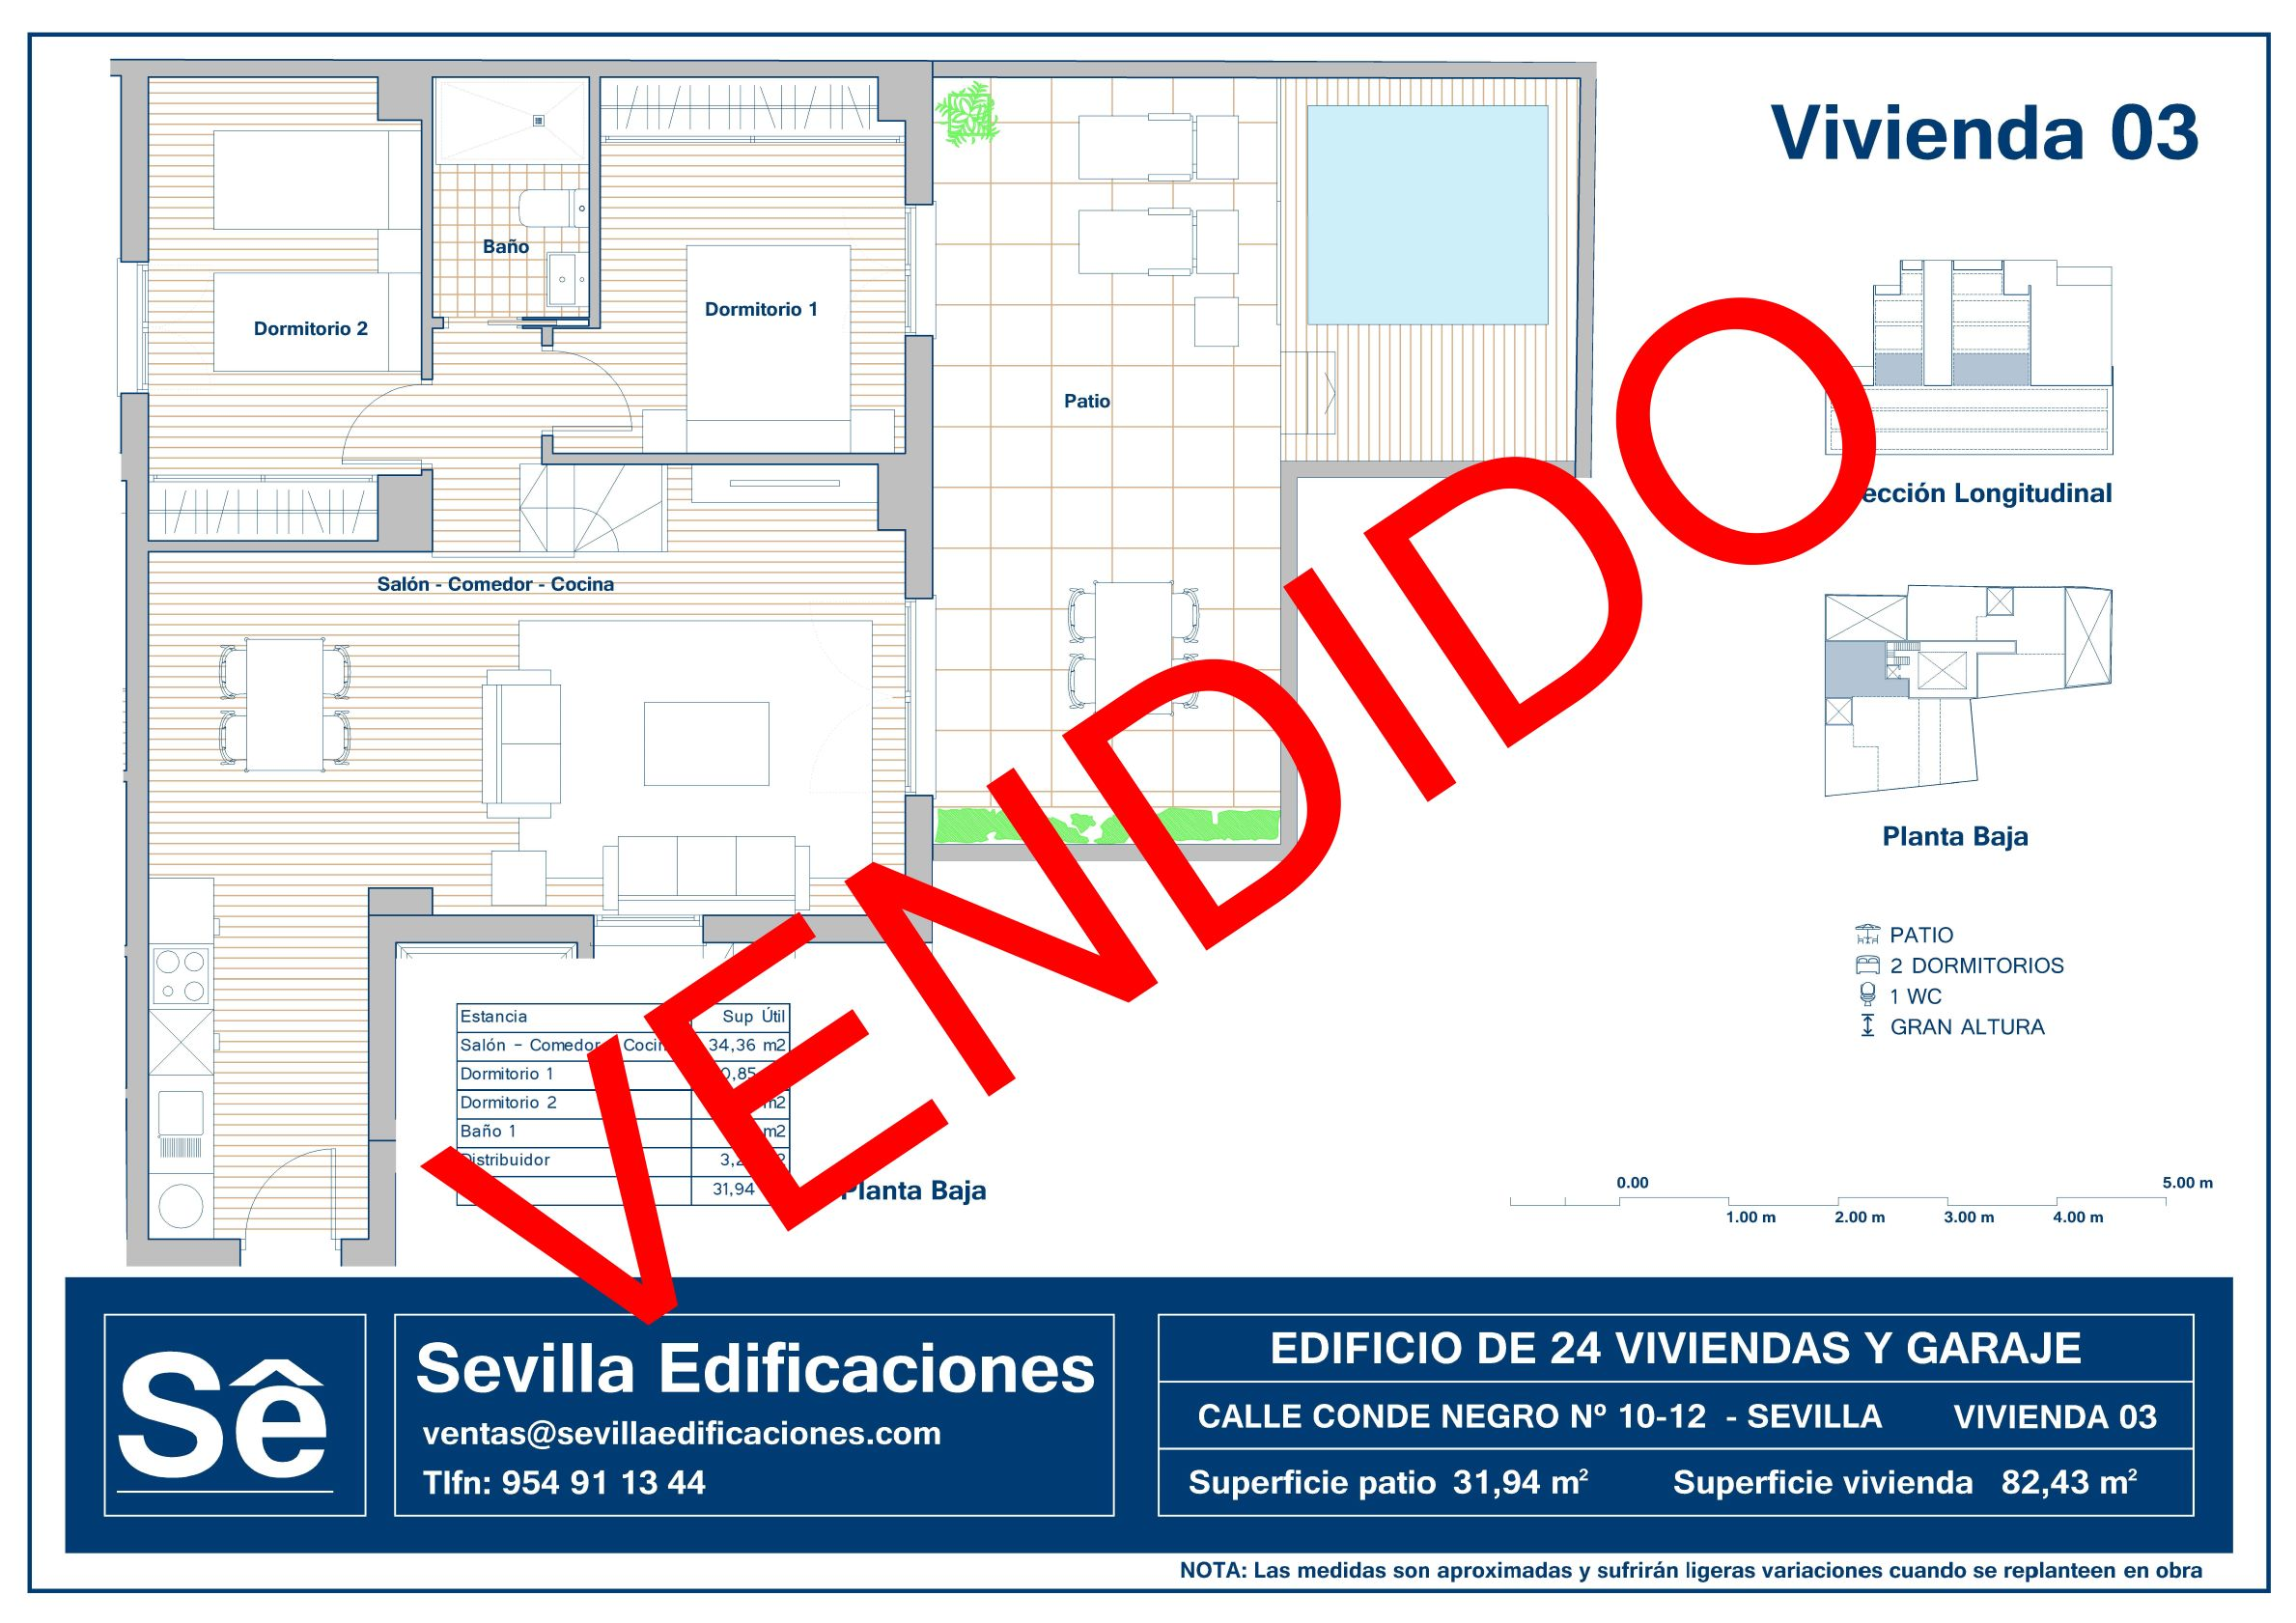 CONDENEGRO_VIVIENDA_03_VENDIDO